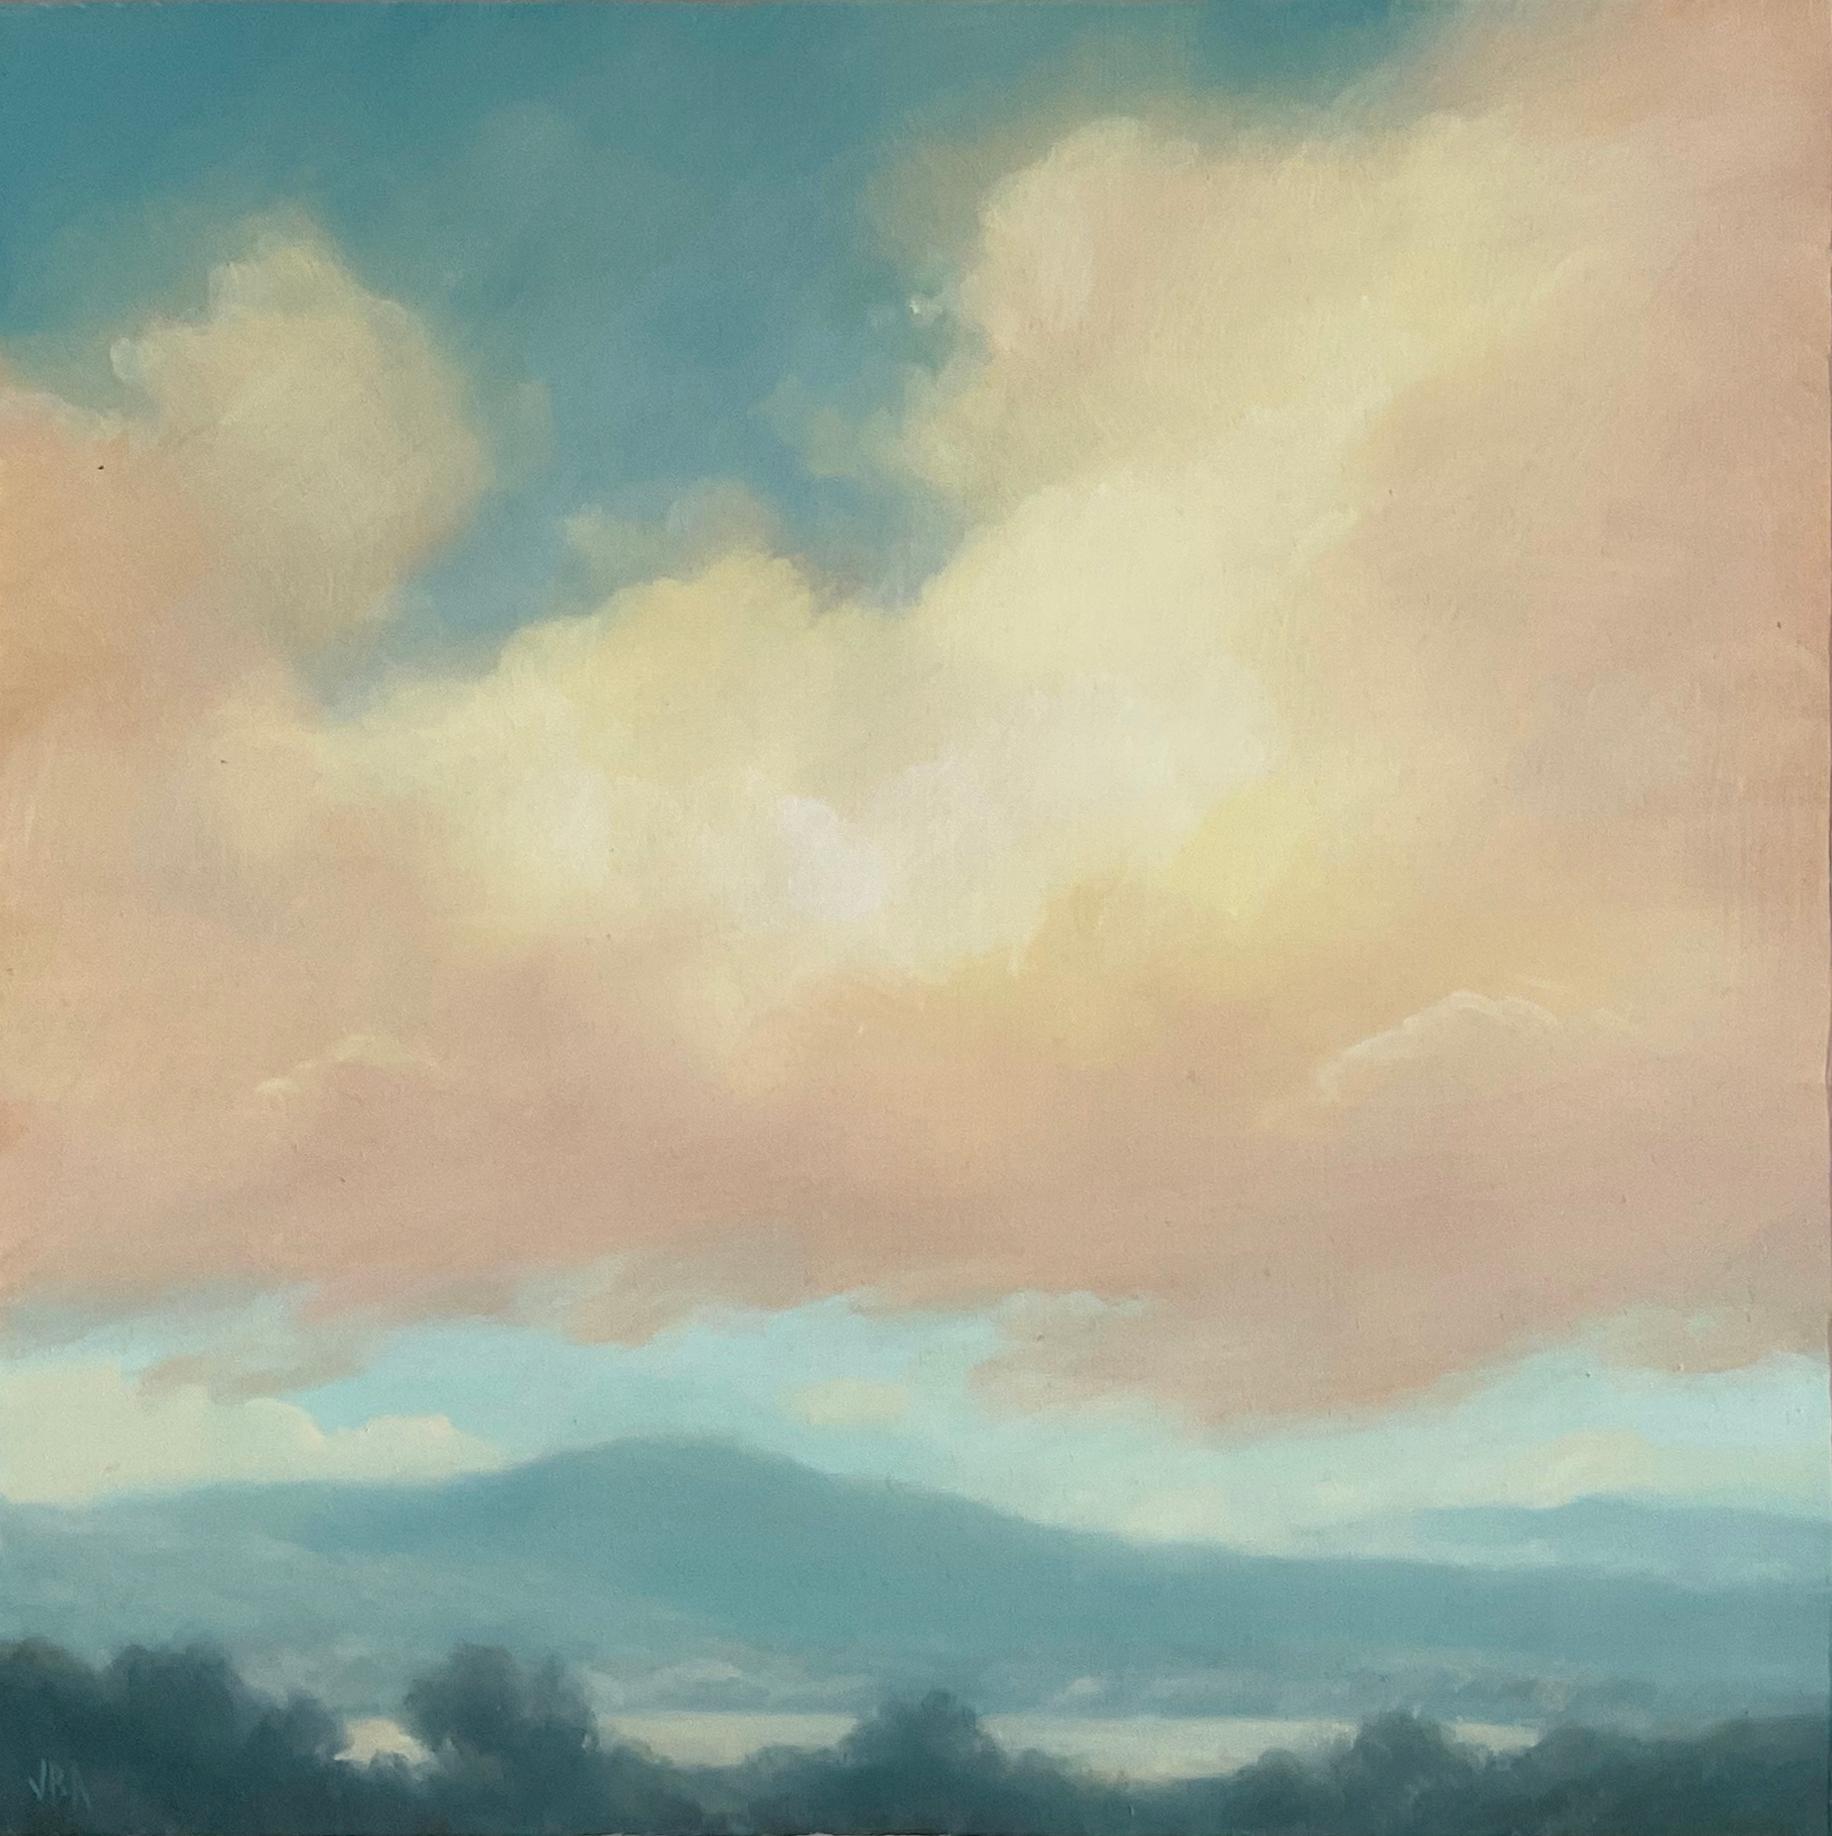 Catskills Spring No. 3 (Contemporary Hudson Valley Landscape Oil Painting)